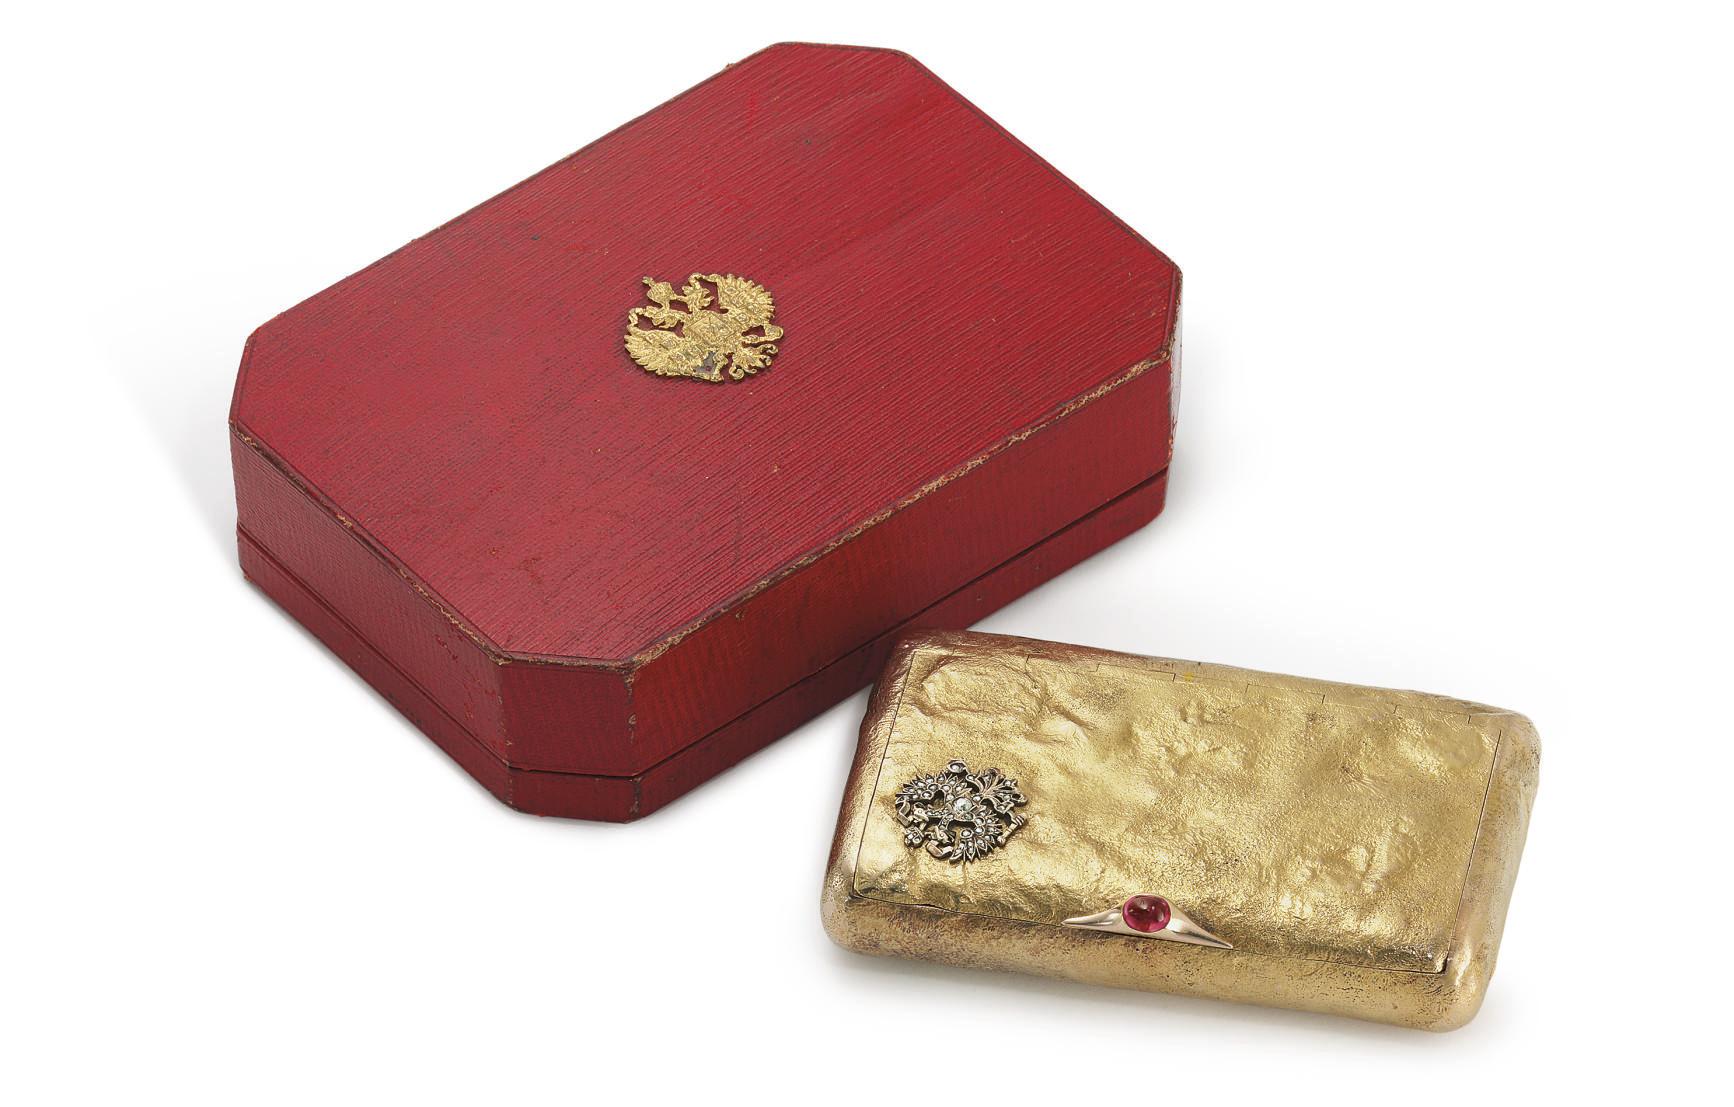 A Jeweled Gold Samorodok Prese